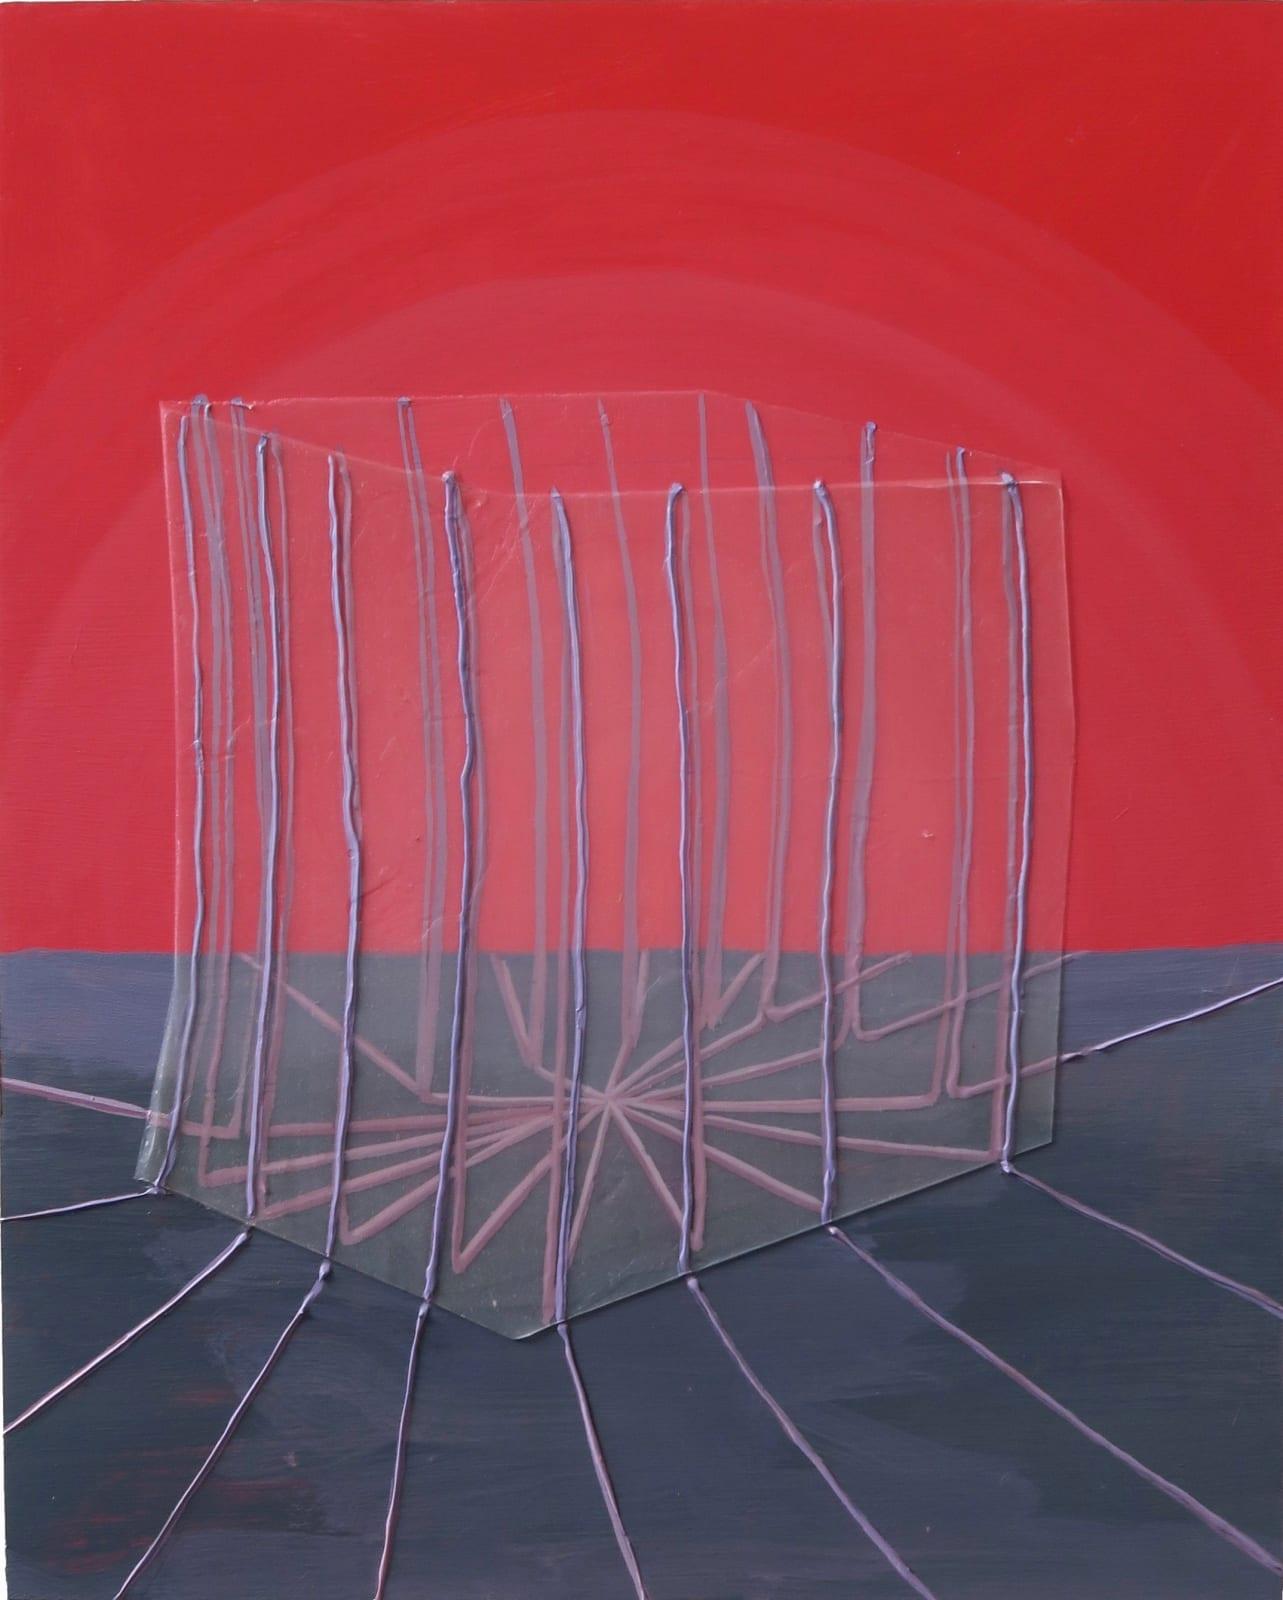 Ricardo Cabret Tu data esta segura, 2021 Polymers and acrylic on panel 20 x 16 in 50.8 x 40.6 cm